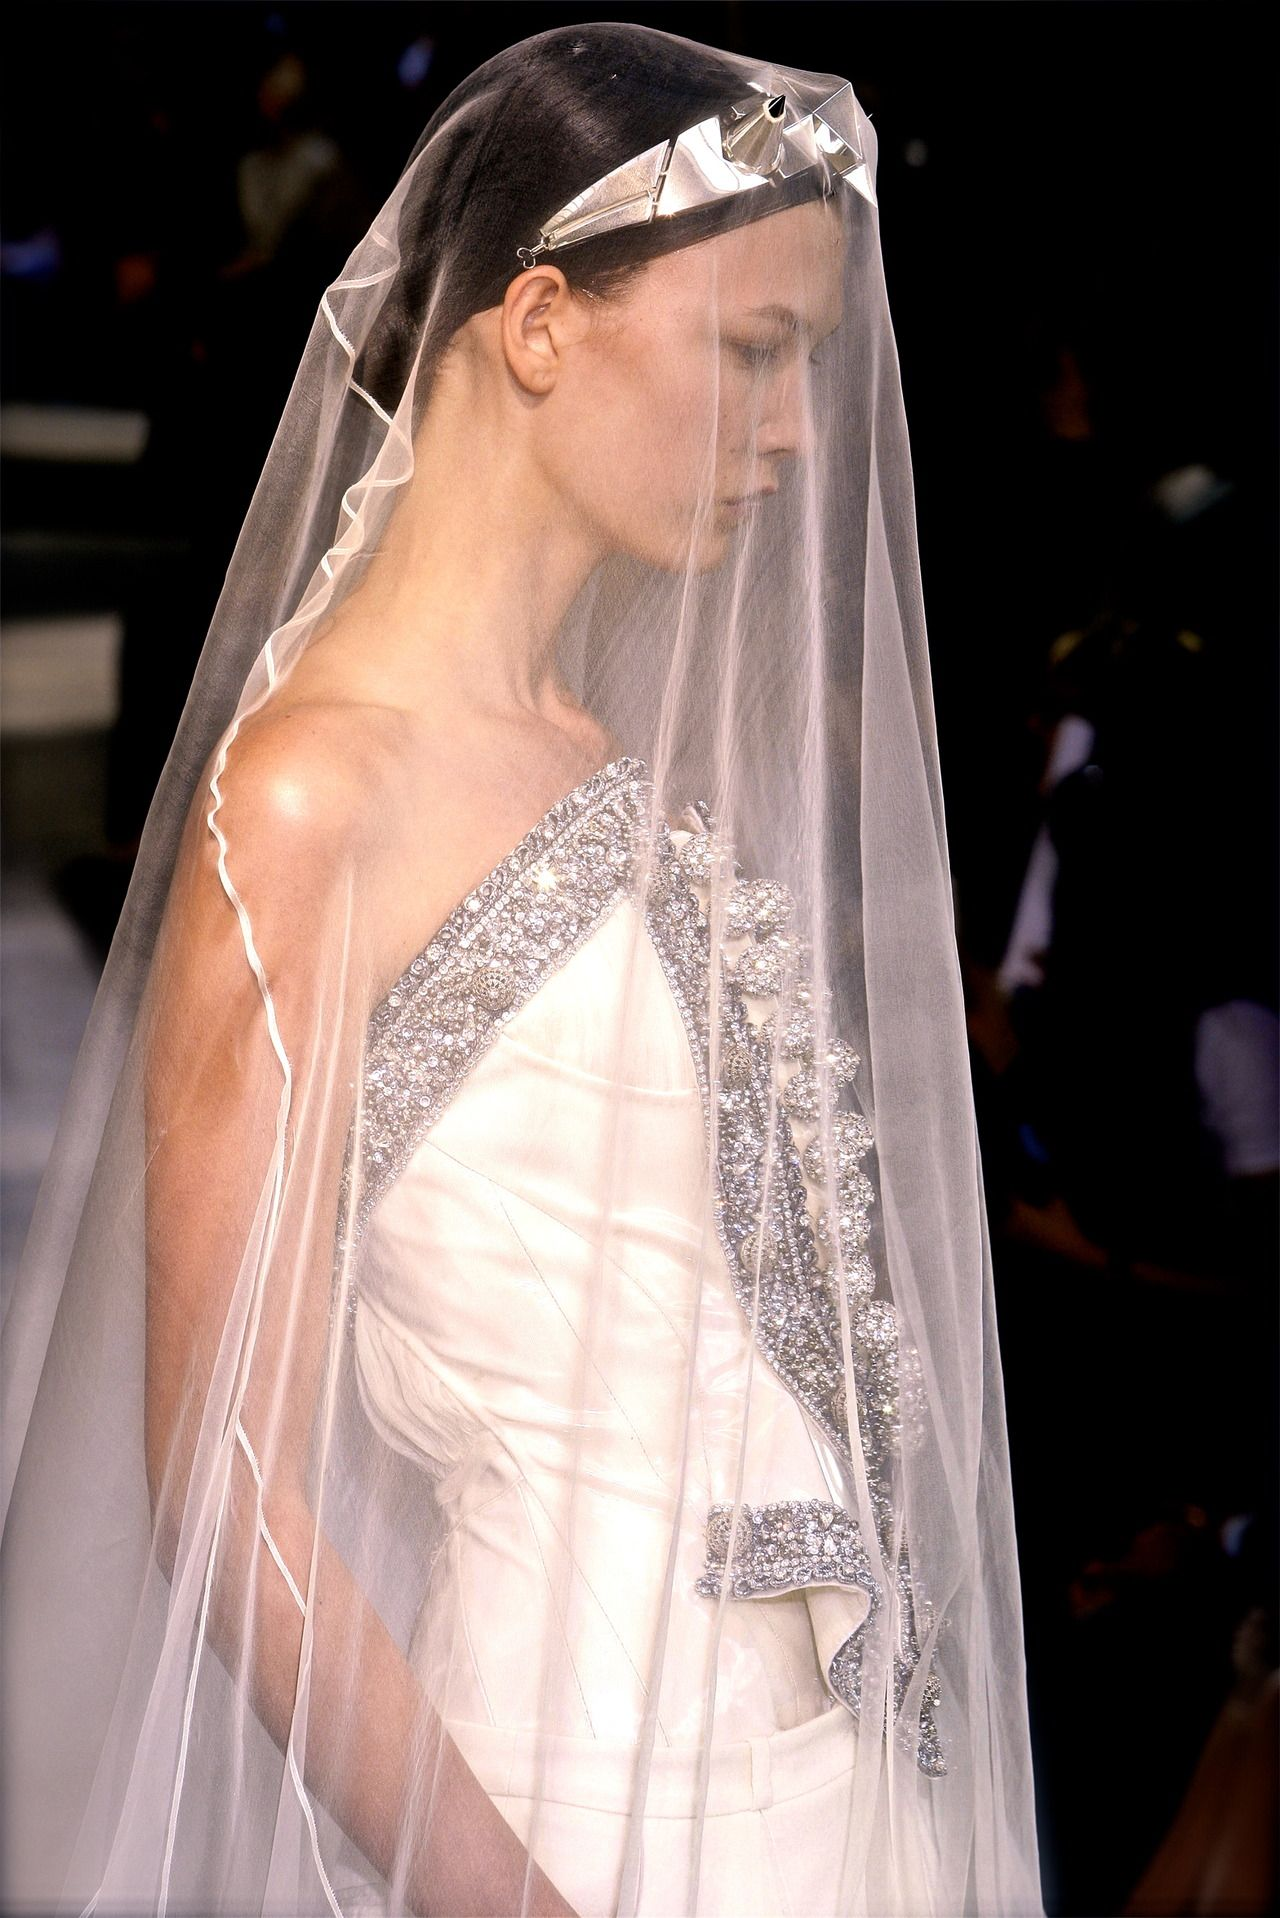 Www Givenchy Com Givenchy Couture Bridal Collection Bride Bridal Wedding Noiva عروس زفاف Novia S Bridal Couture Wedding Dresses Latest Fashion Dresses